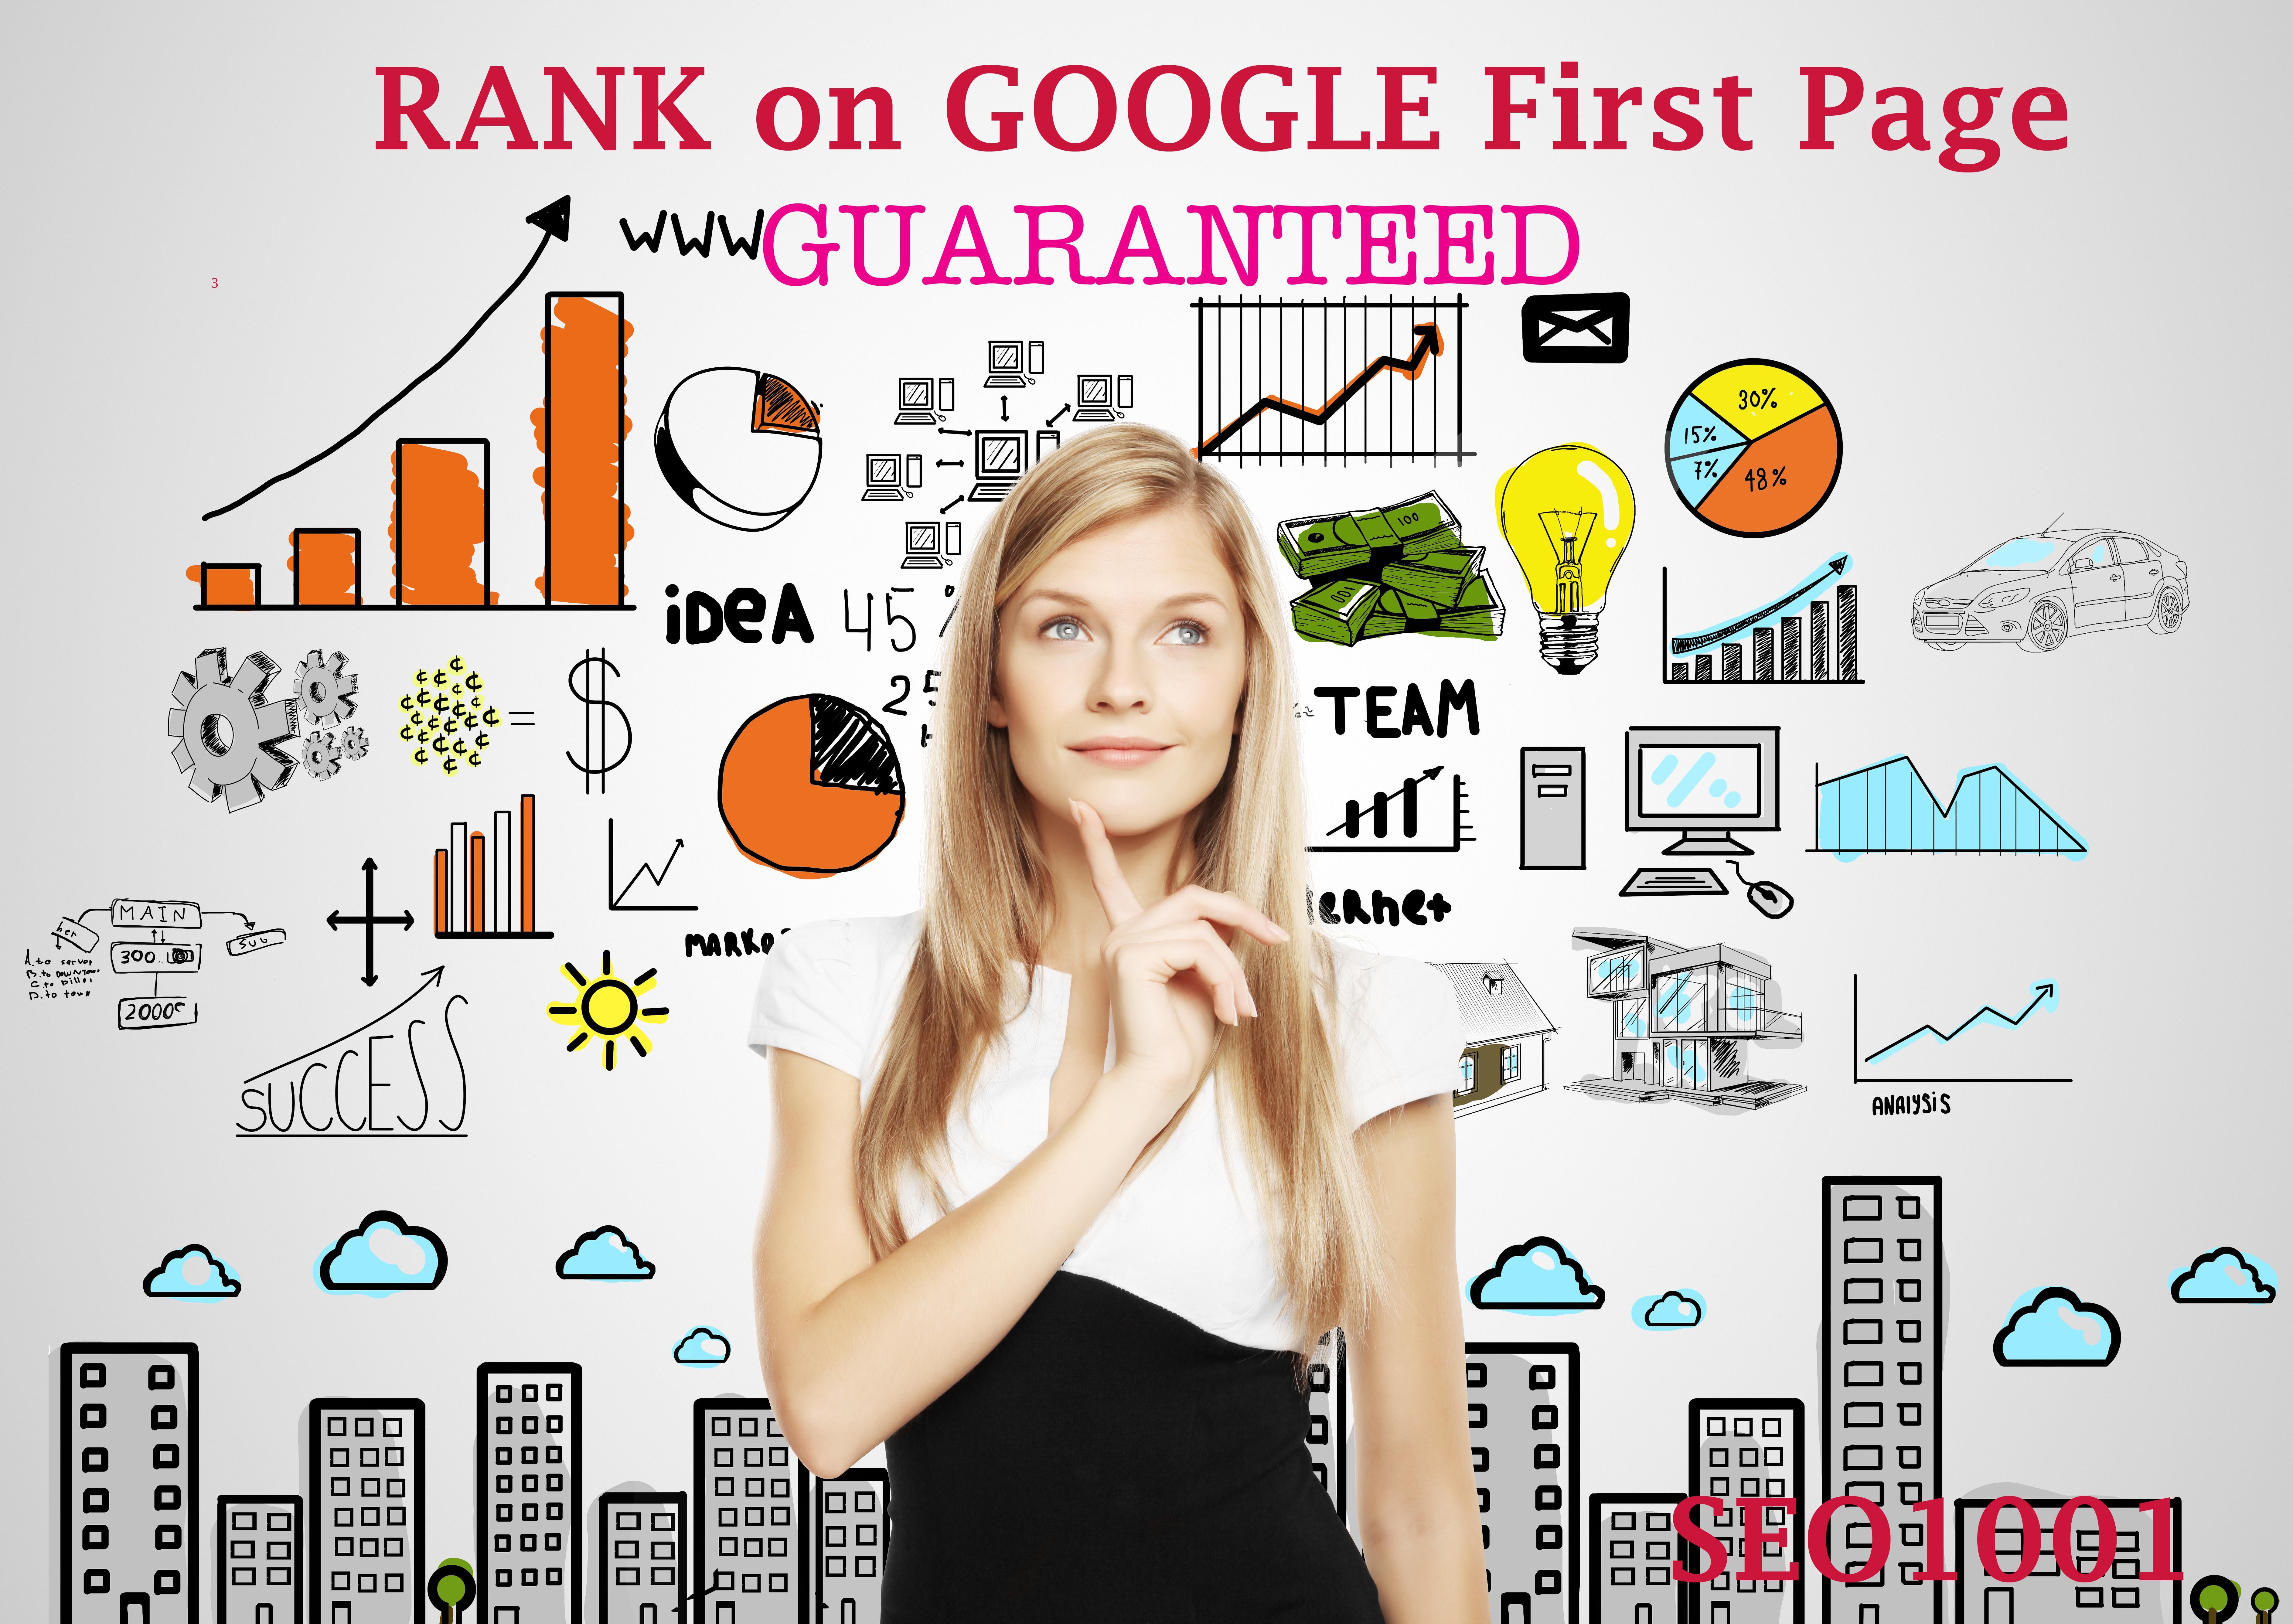 RANK on Google First Page - GUARANTEED